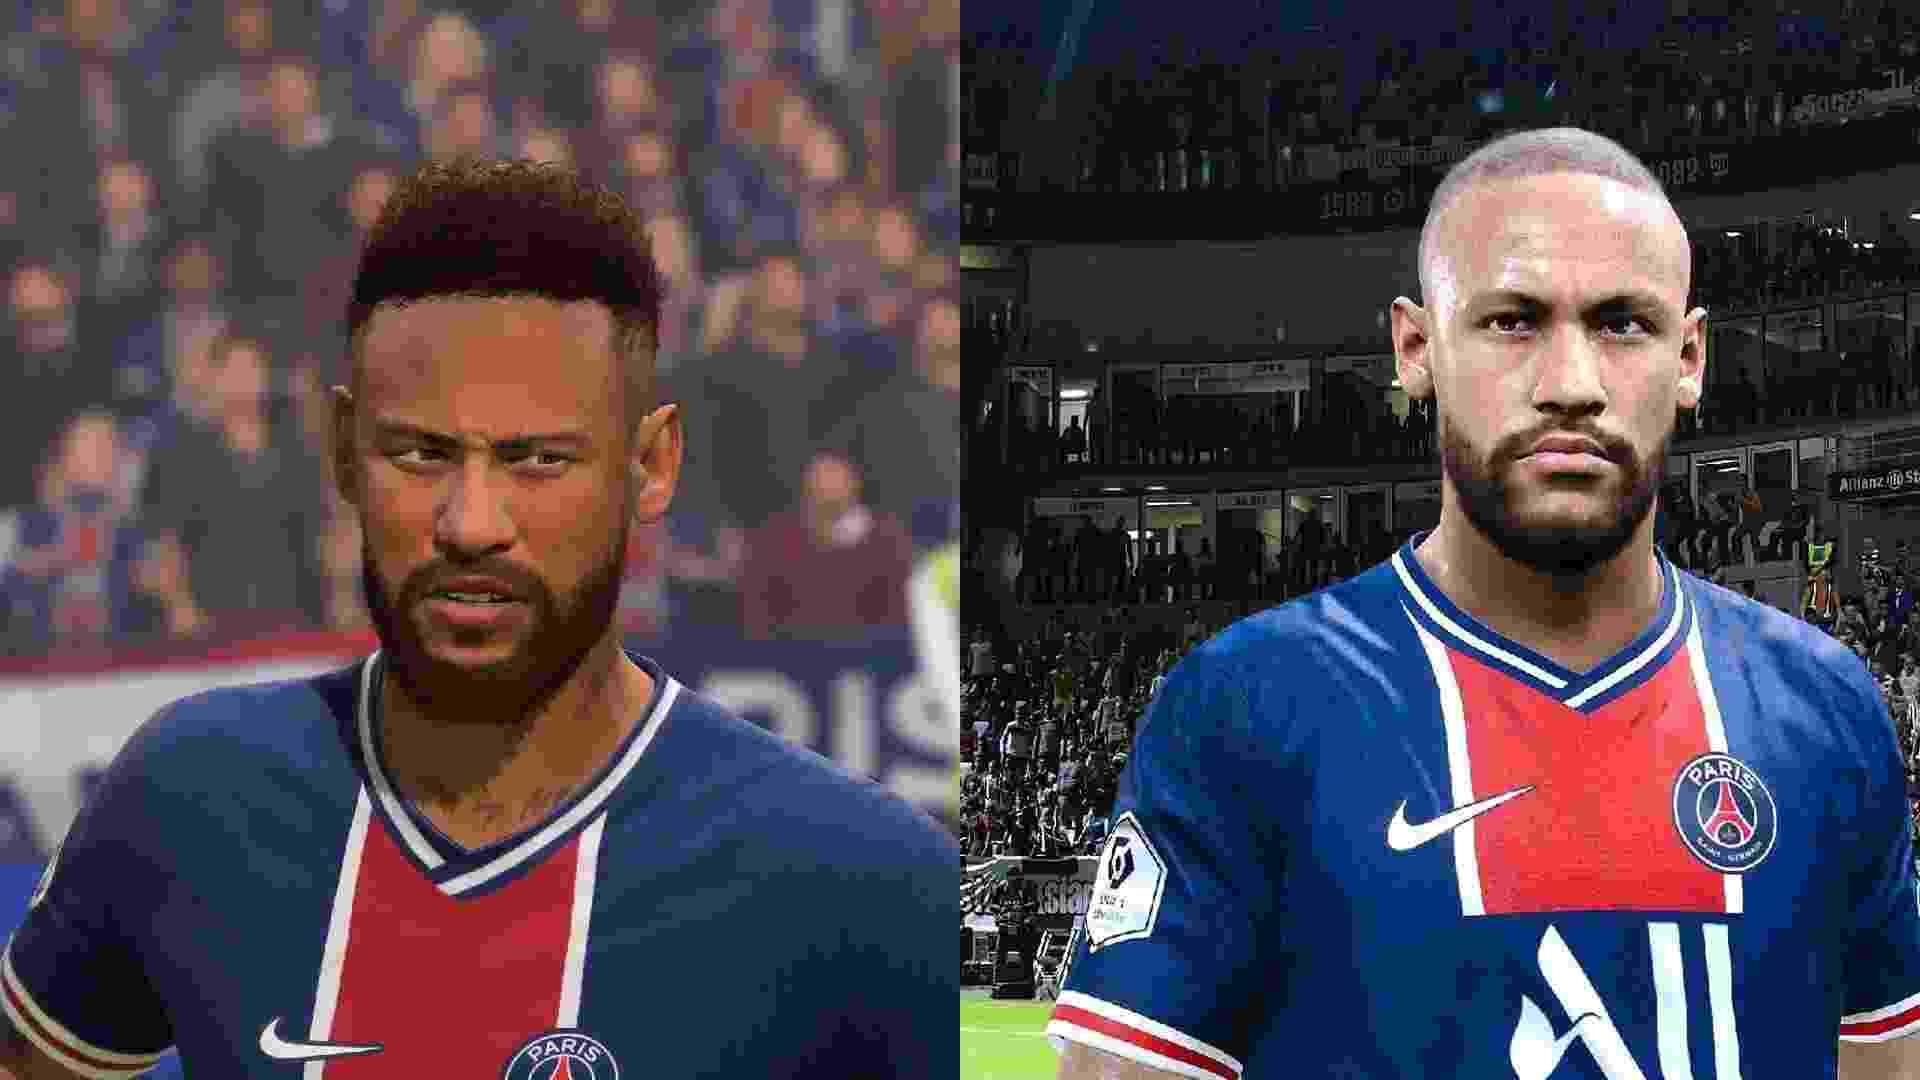 Neymar FIFA 21 PES 2021 - Reprodução/START